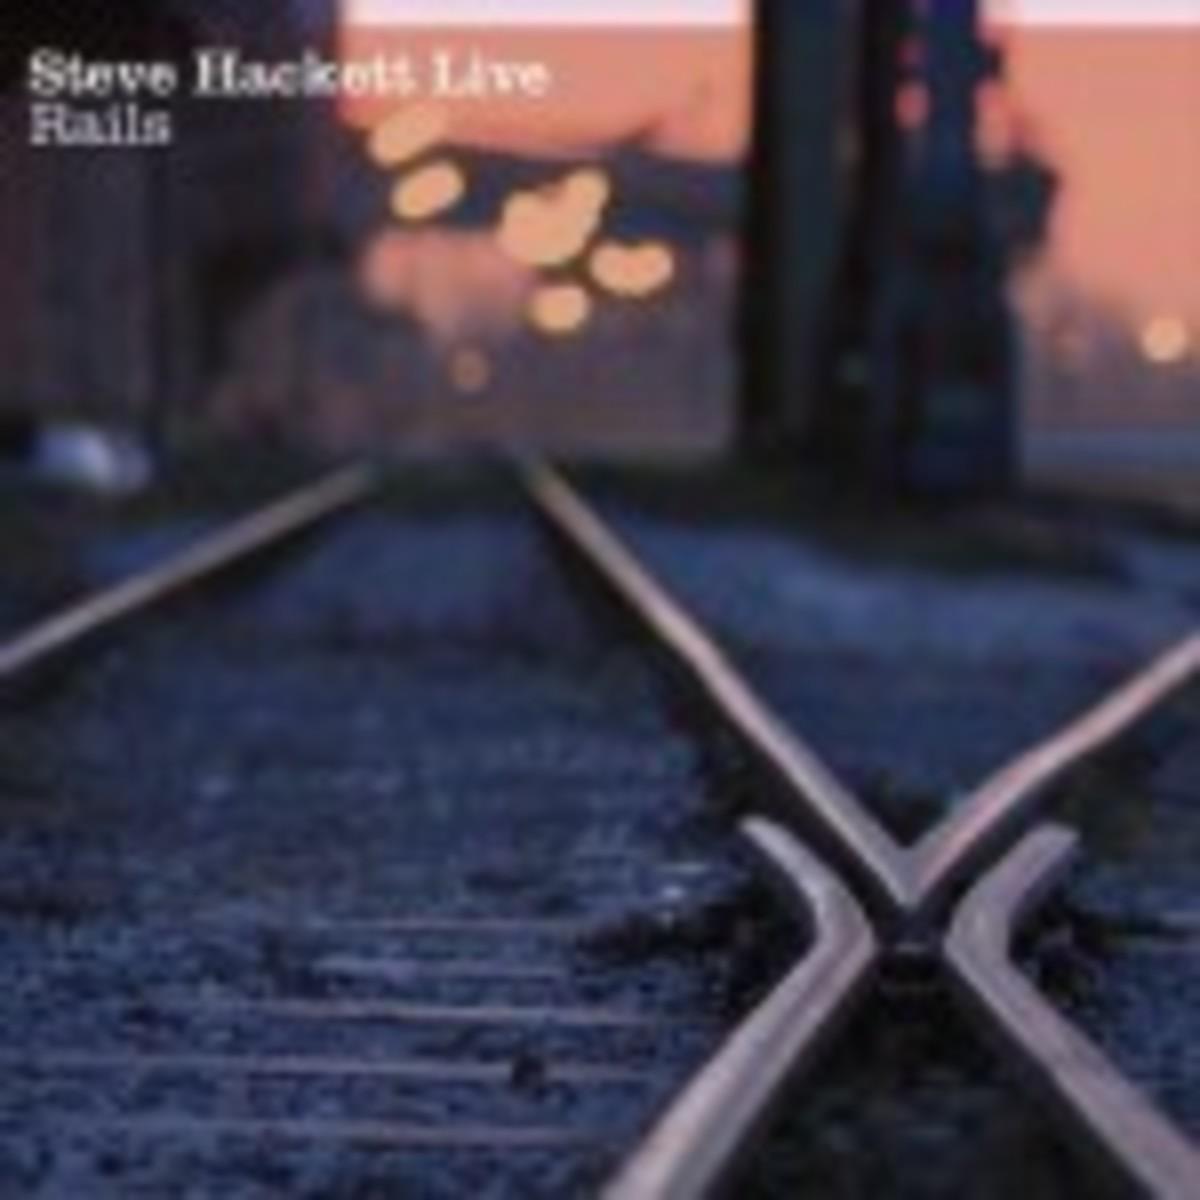 Steve Hackett Live Rails